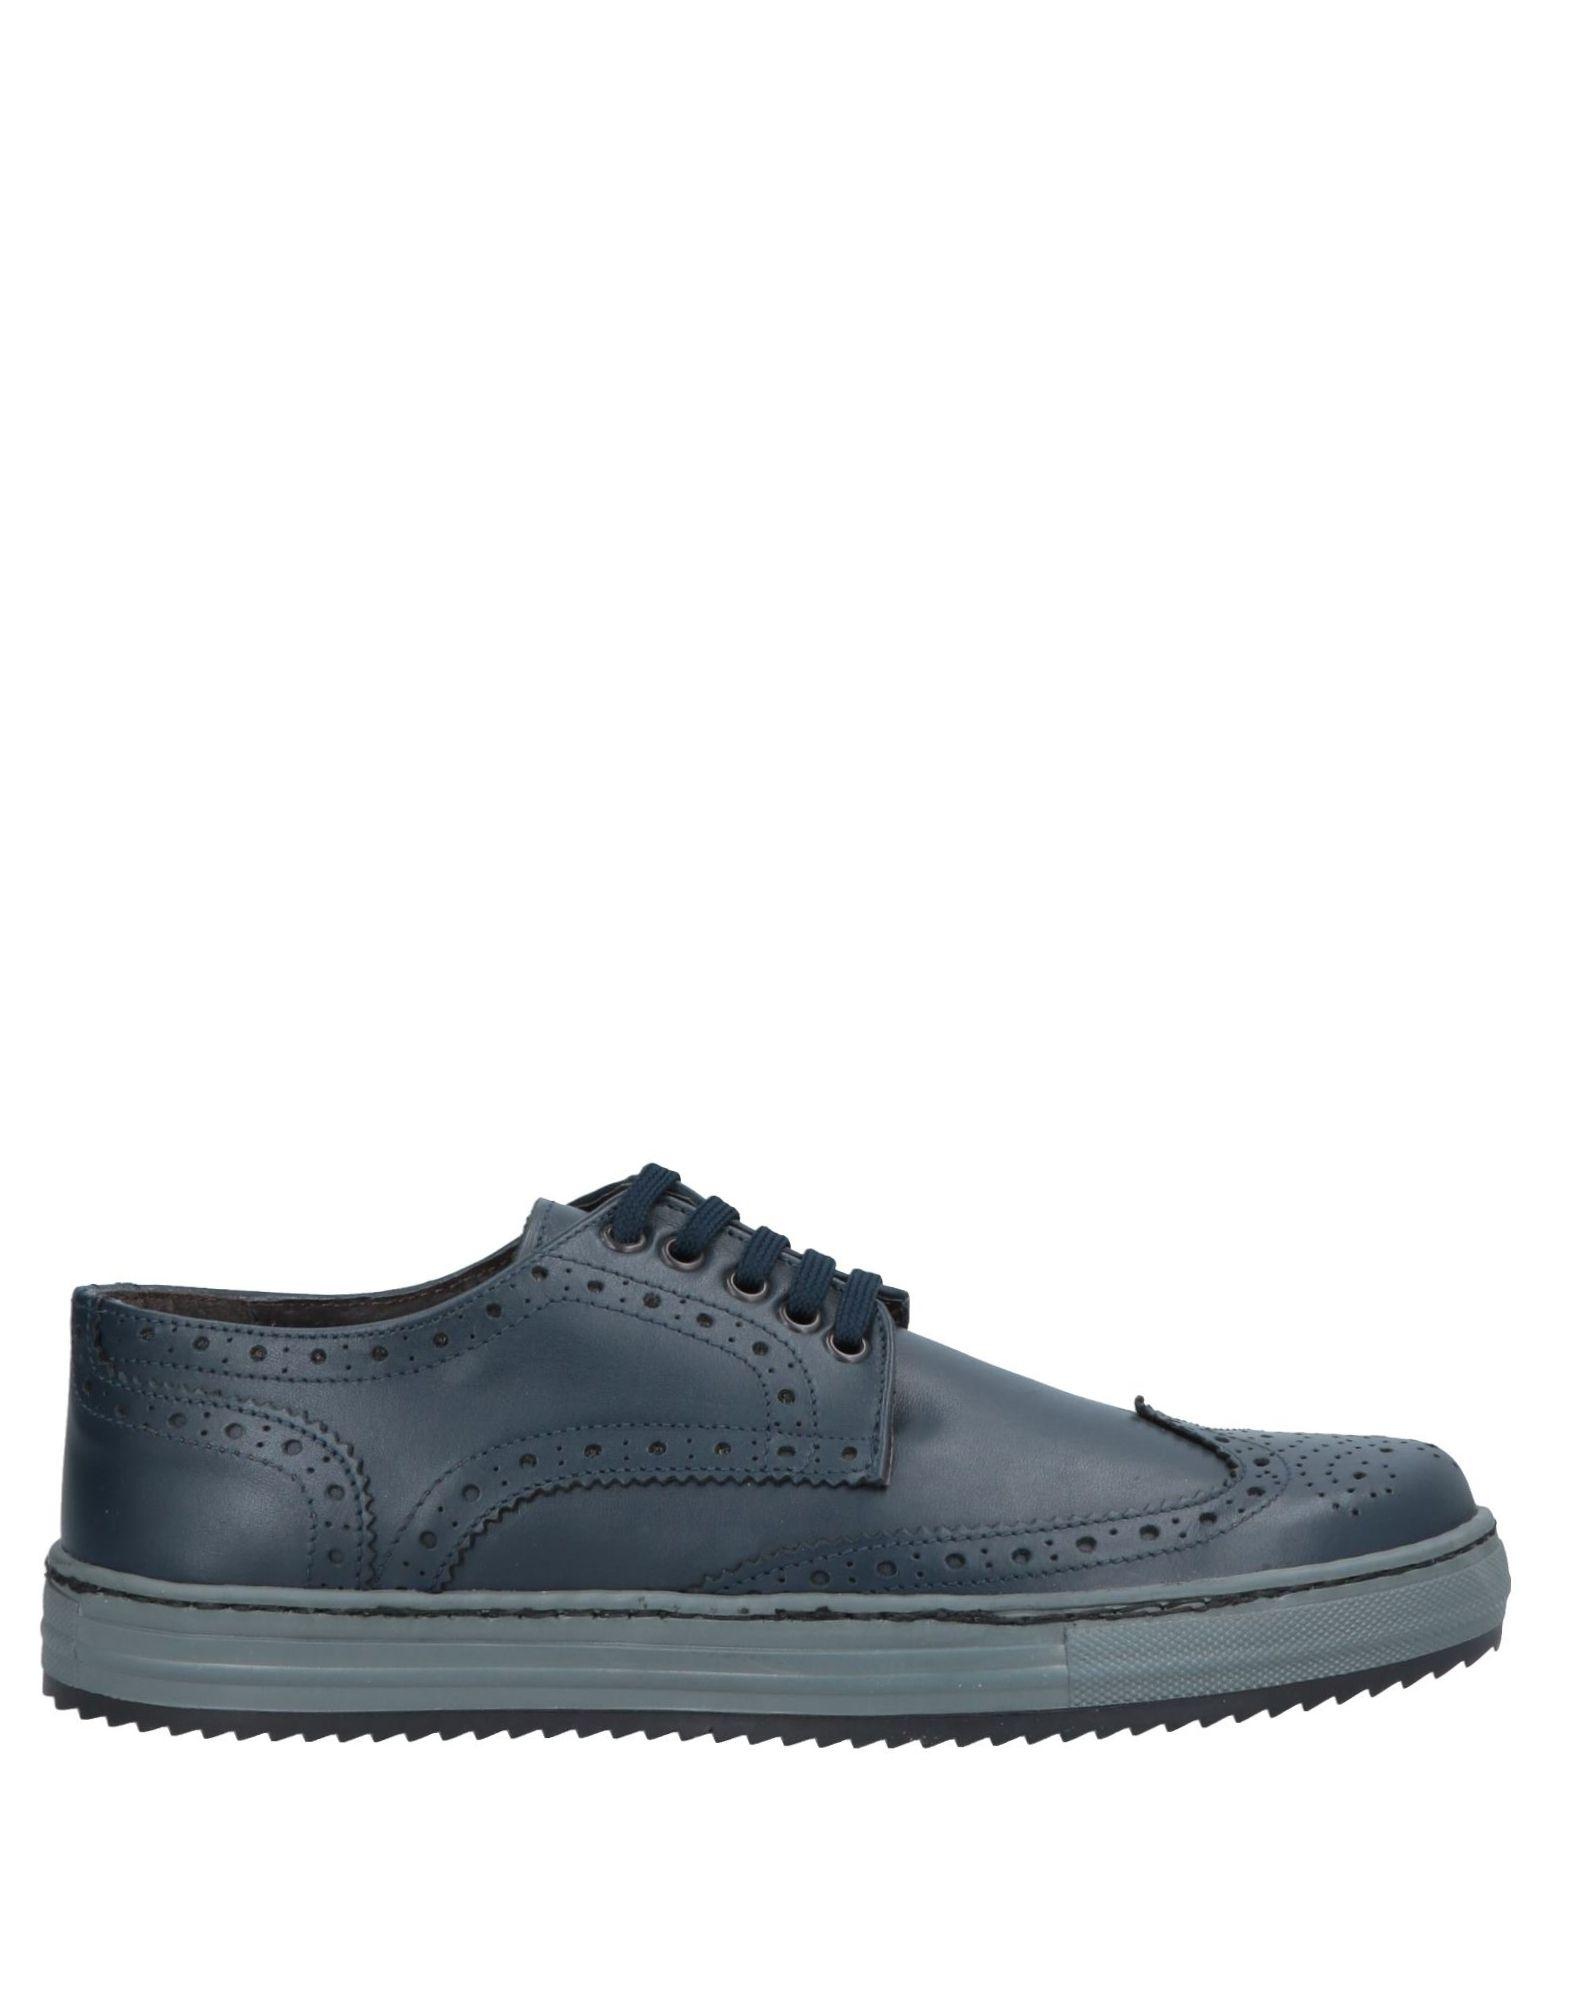 WIL DEMULDER London Обувь на шнурках обувь на высокой платформе buffalo london 2013